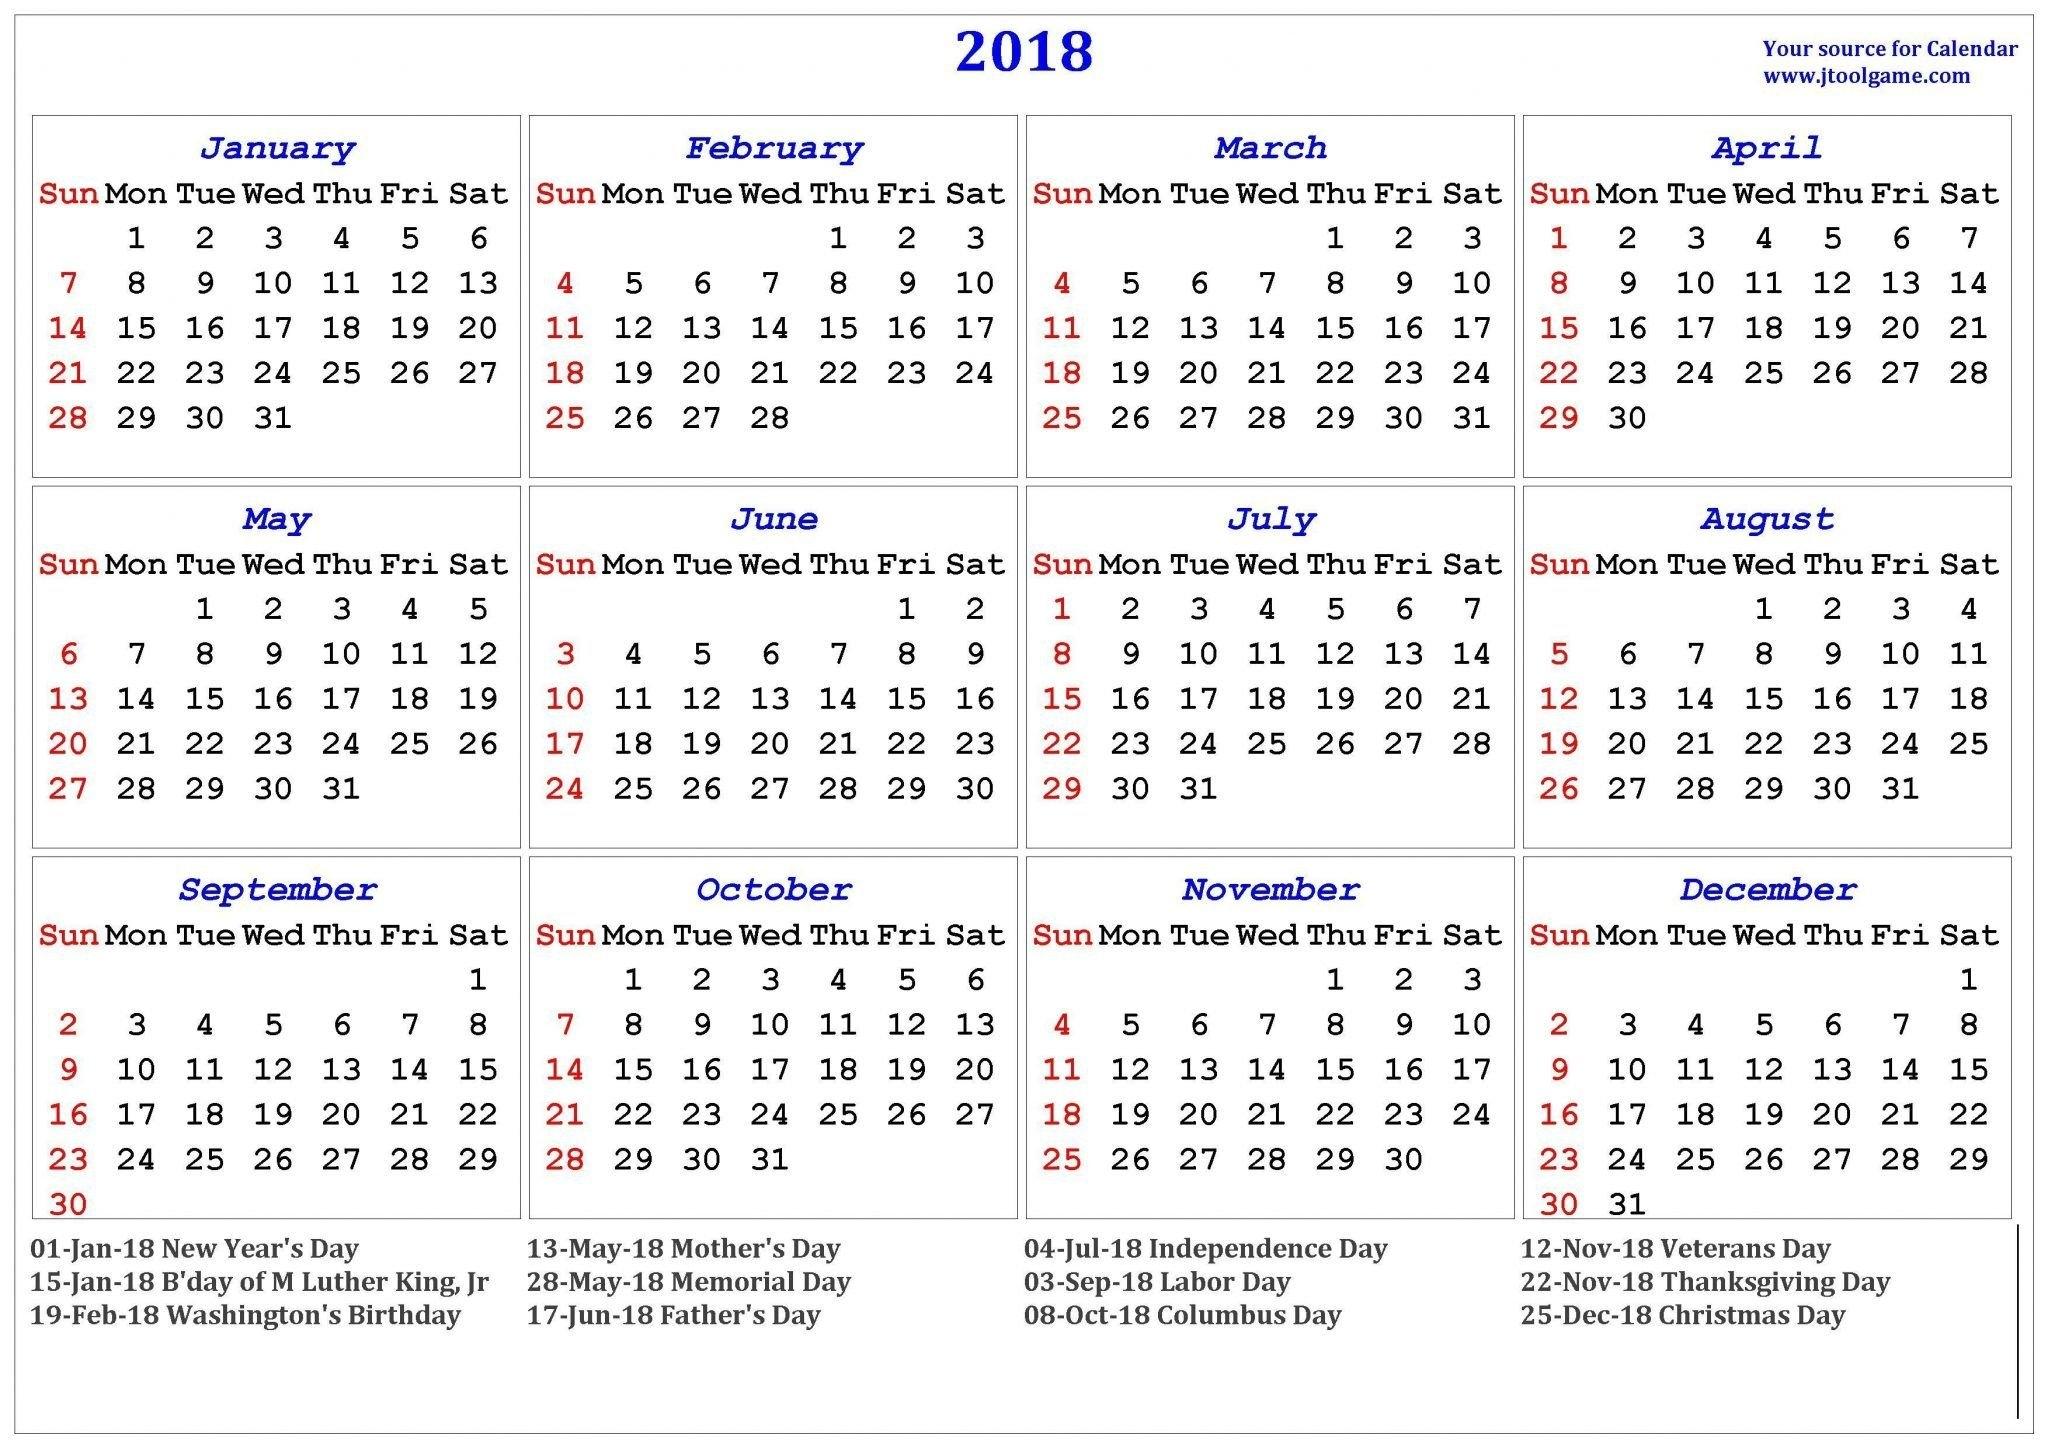 2019 Holidays Usa | Blank November 2018 Calendar | Pinterest Calendar 2019 With Holidays Usa